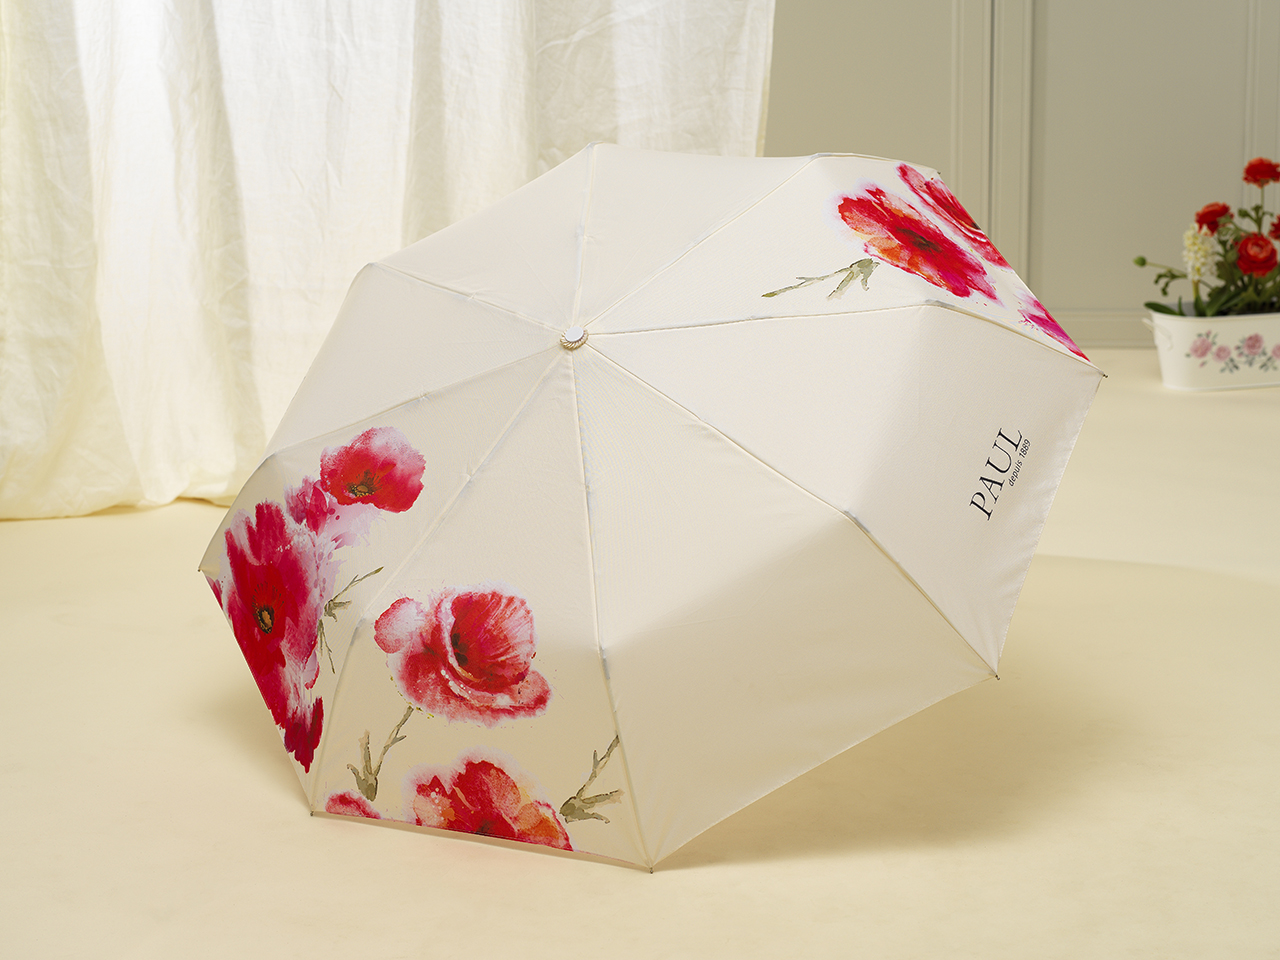 PAUL亞維儂花園造型自動傘 Garden of Avignon Automatic Umbrella